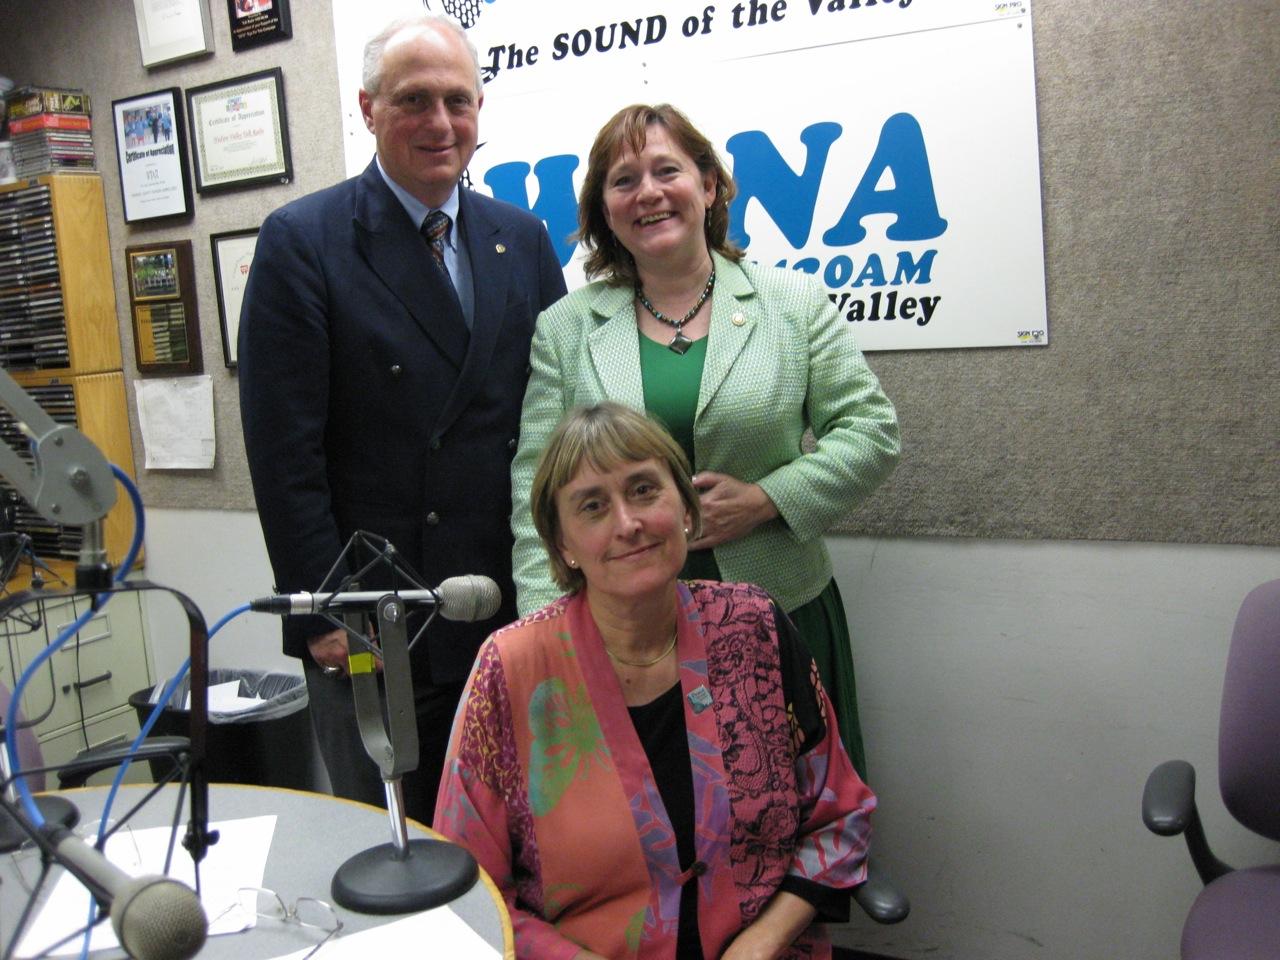 Seated Patty Moore Standing Co Hosts Jonah Triebwasser